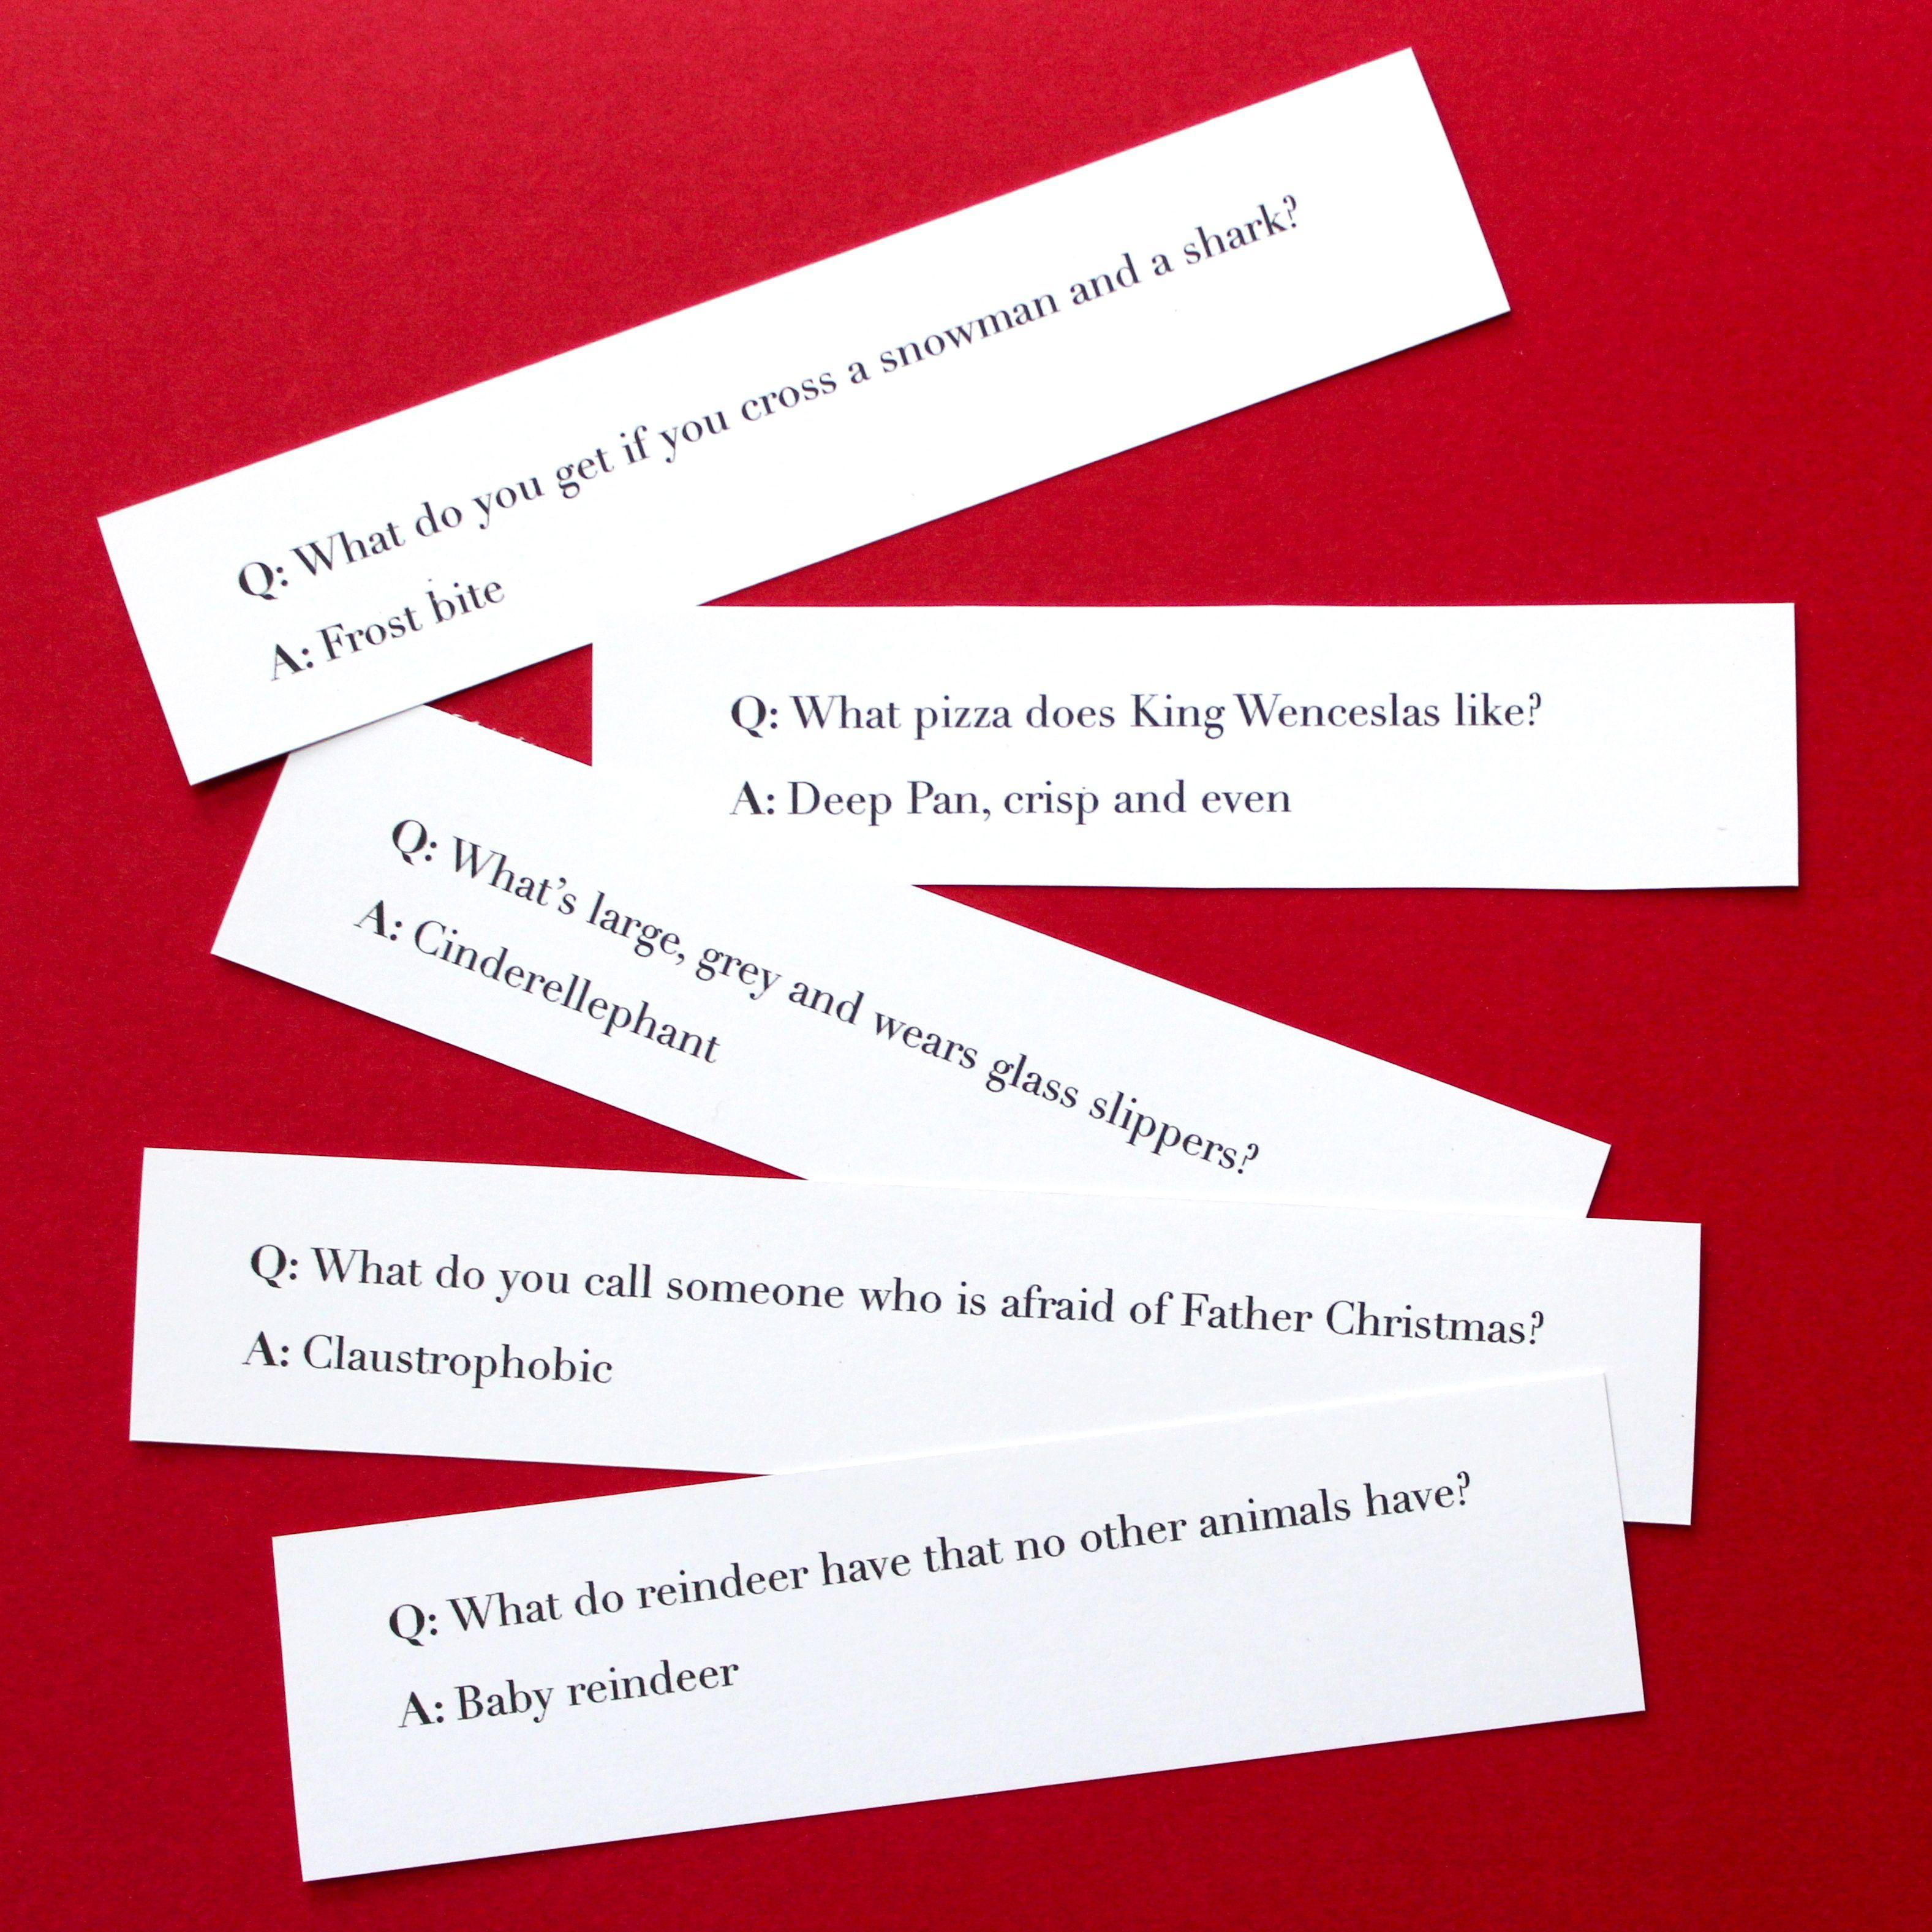 Funny Christmas Riddles And Jokes Xmas Cracker Jokes Christmas Crackers Diy Christmas Crackers Christmas Jokes